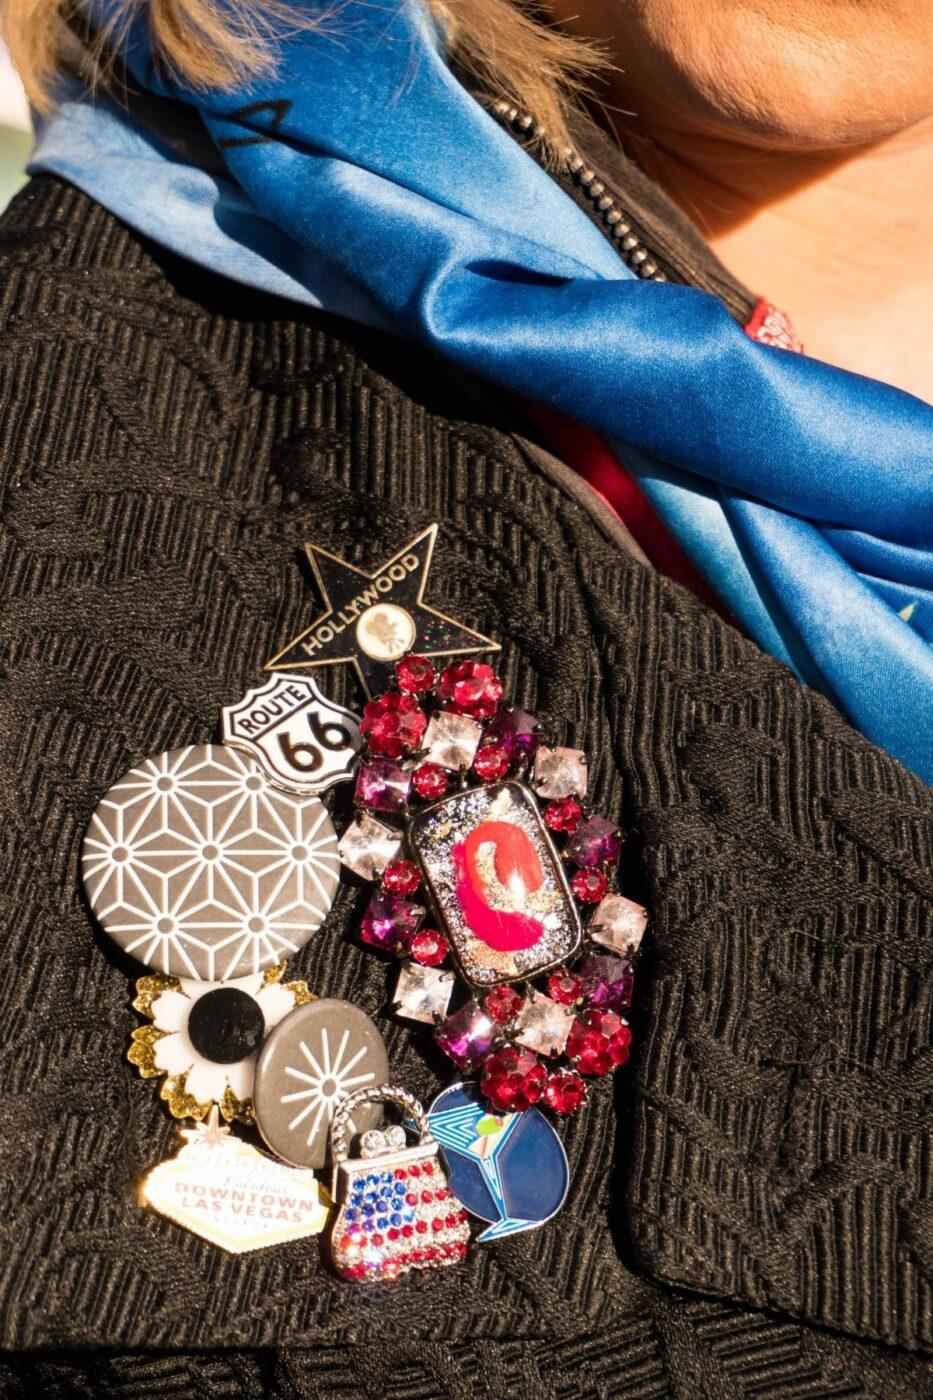 travel souvenir ideas, Awesome Fashion Inspiration + Ideas for Buried, Unused Travel Souvenirs